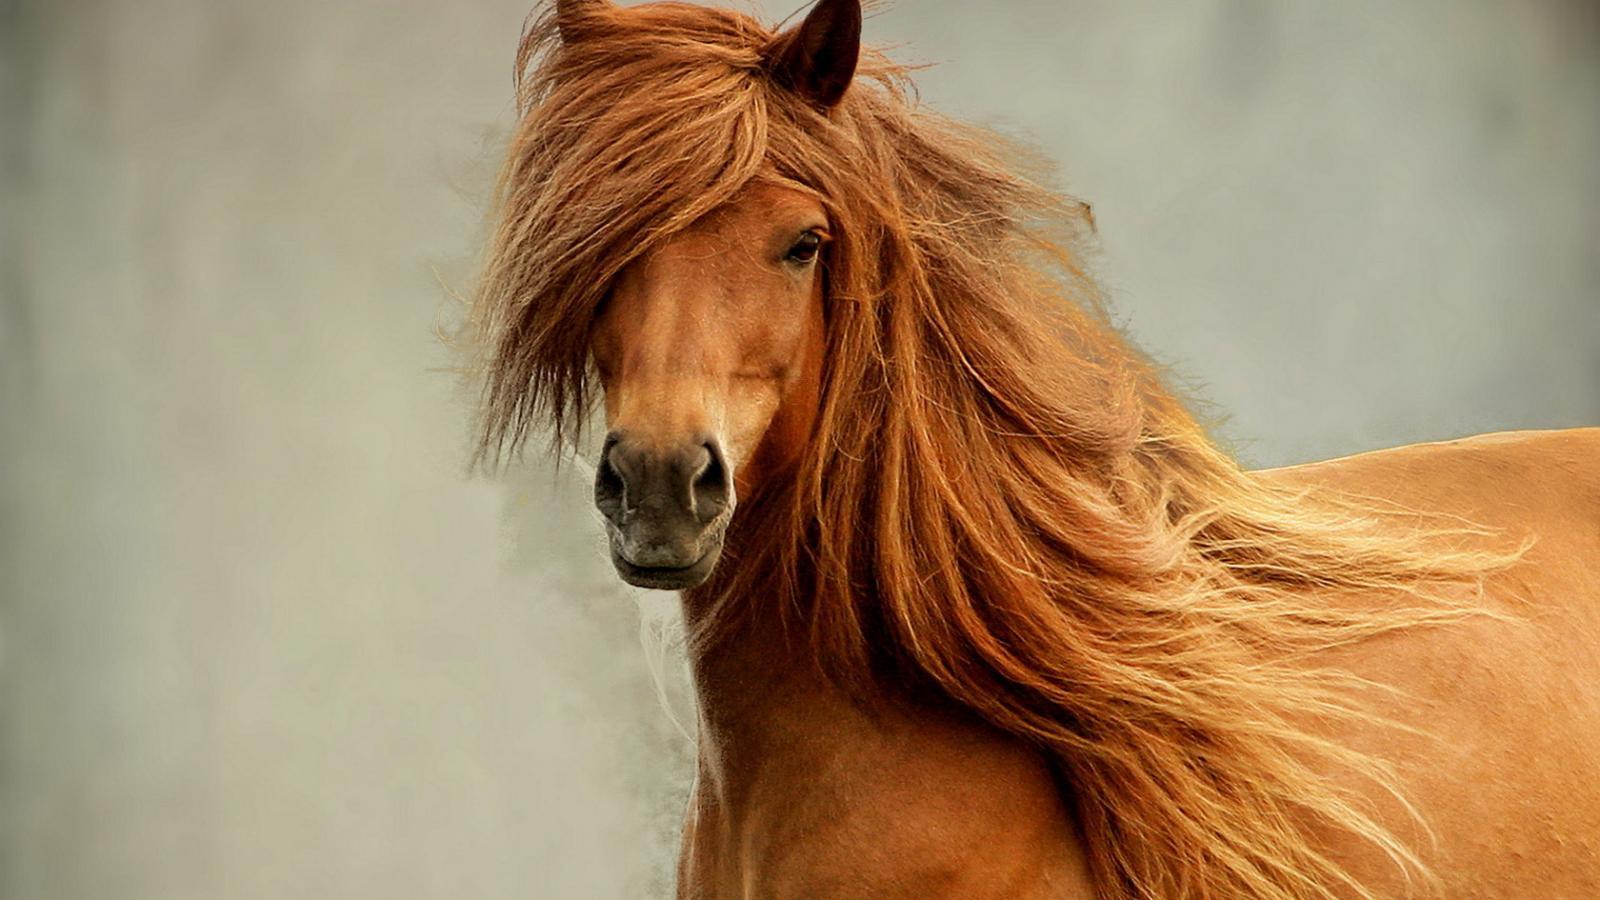 Wild Horse Wallpapers